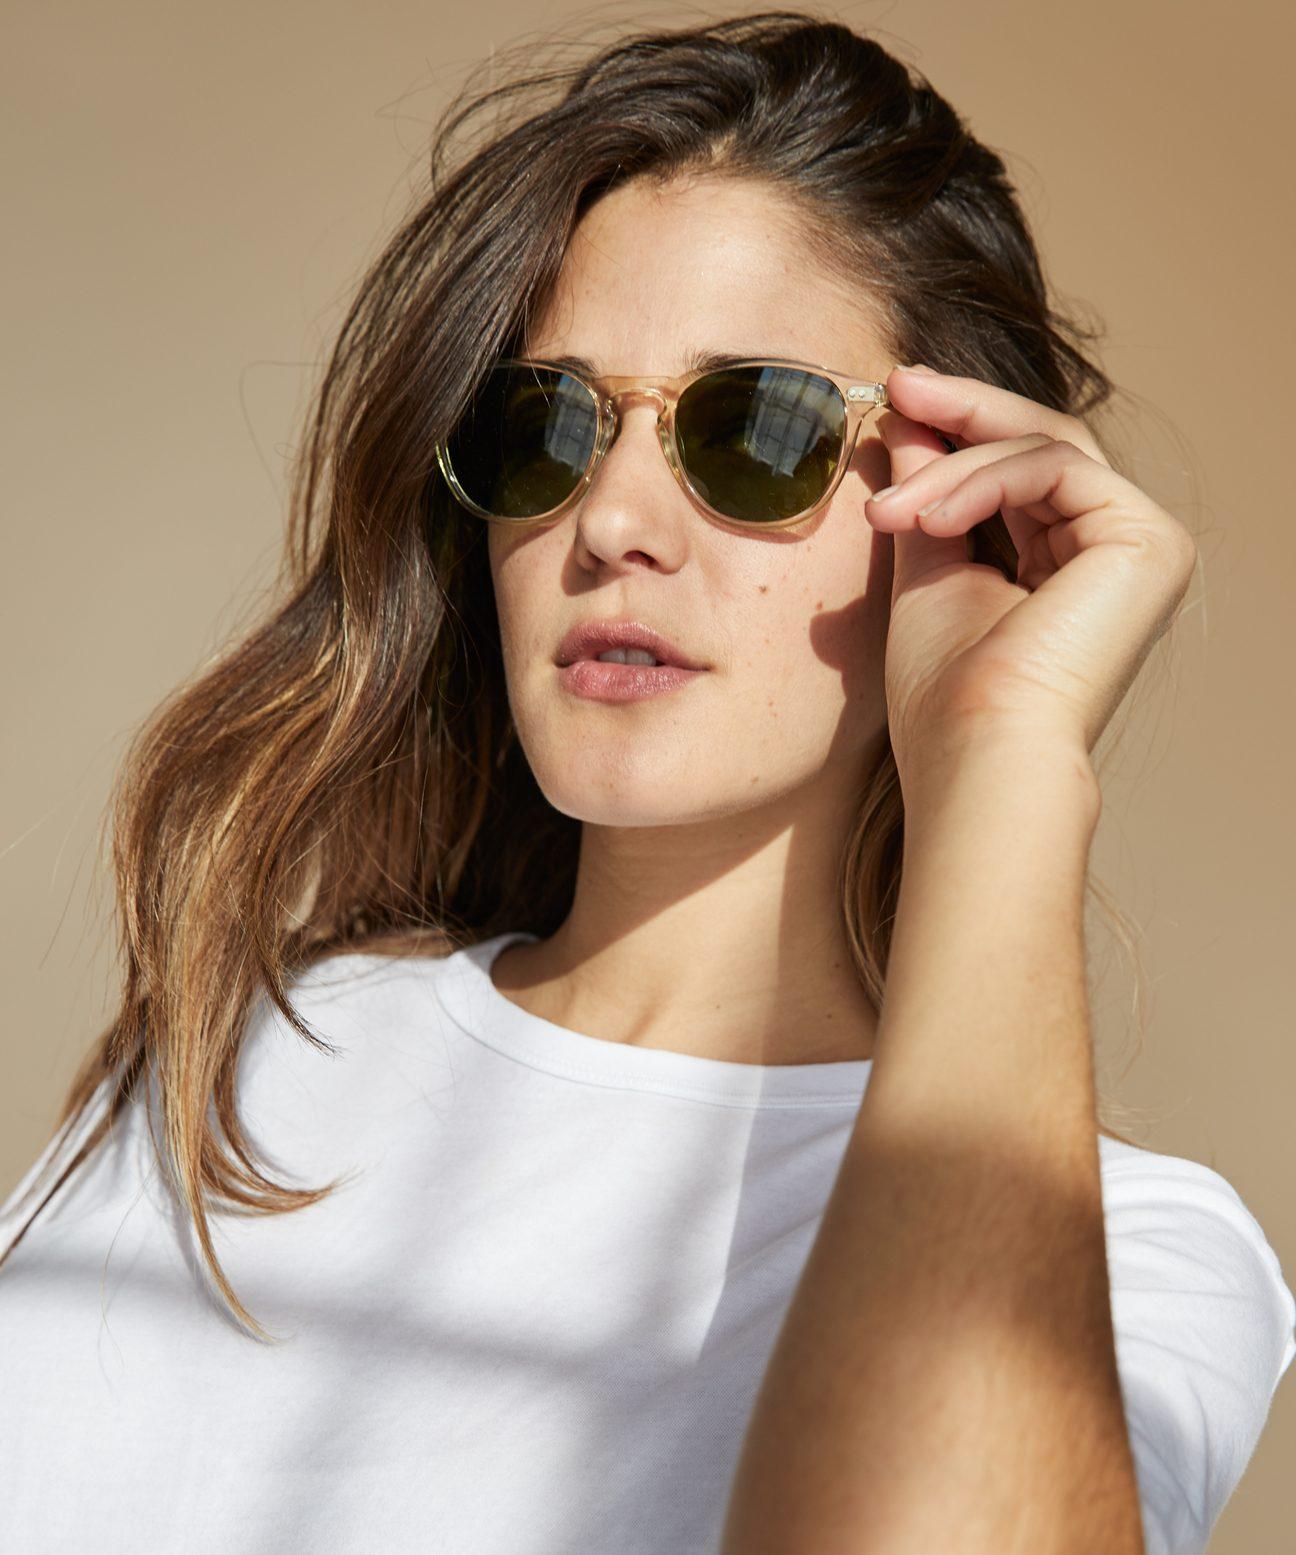 e23cf9df6b3 Hampton Sunglasses - Champagne/Green | Jenni Kayne